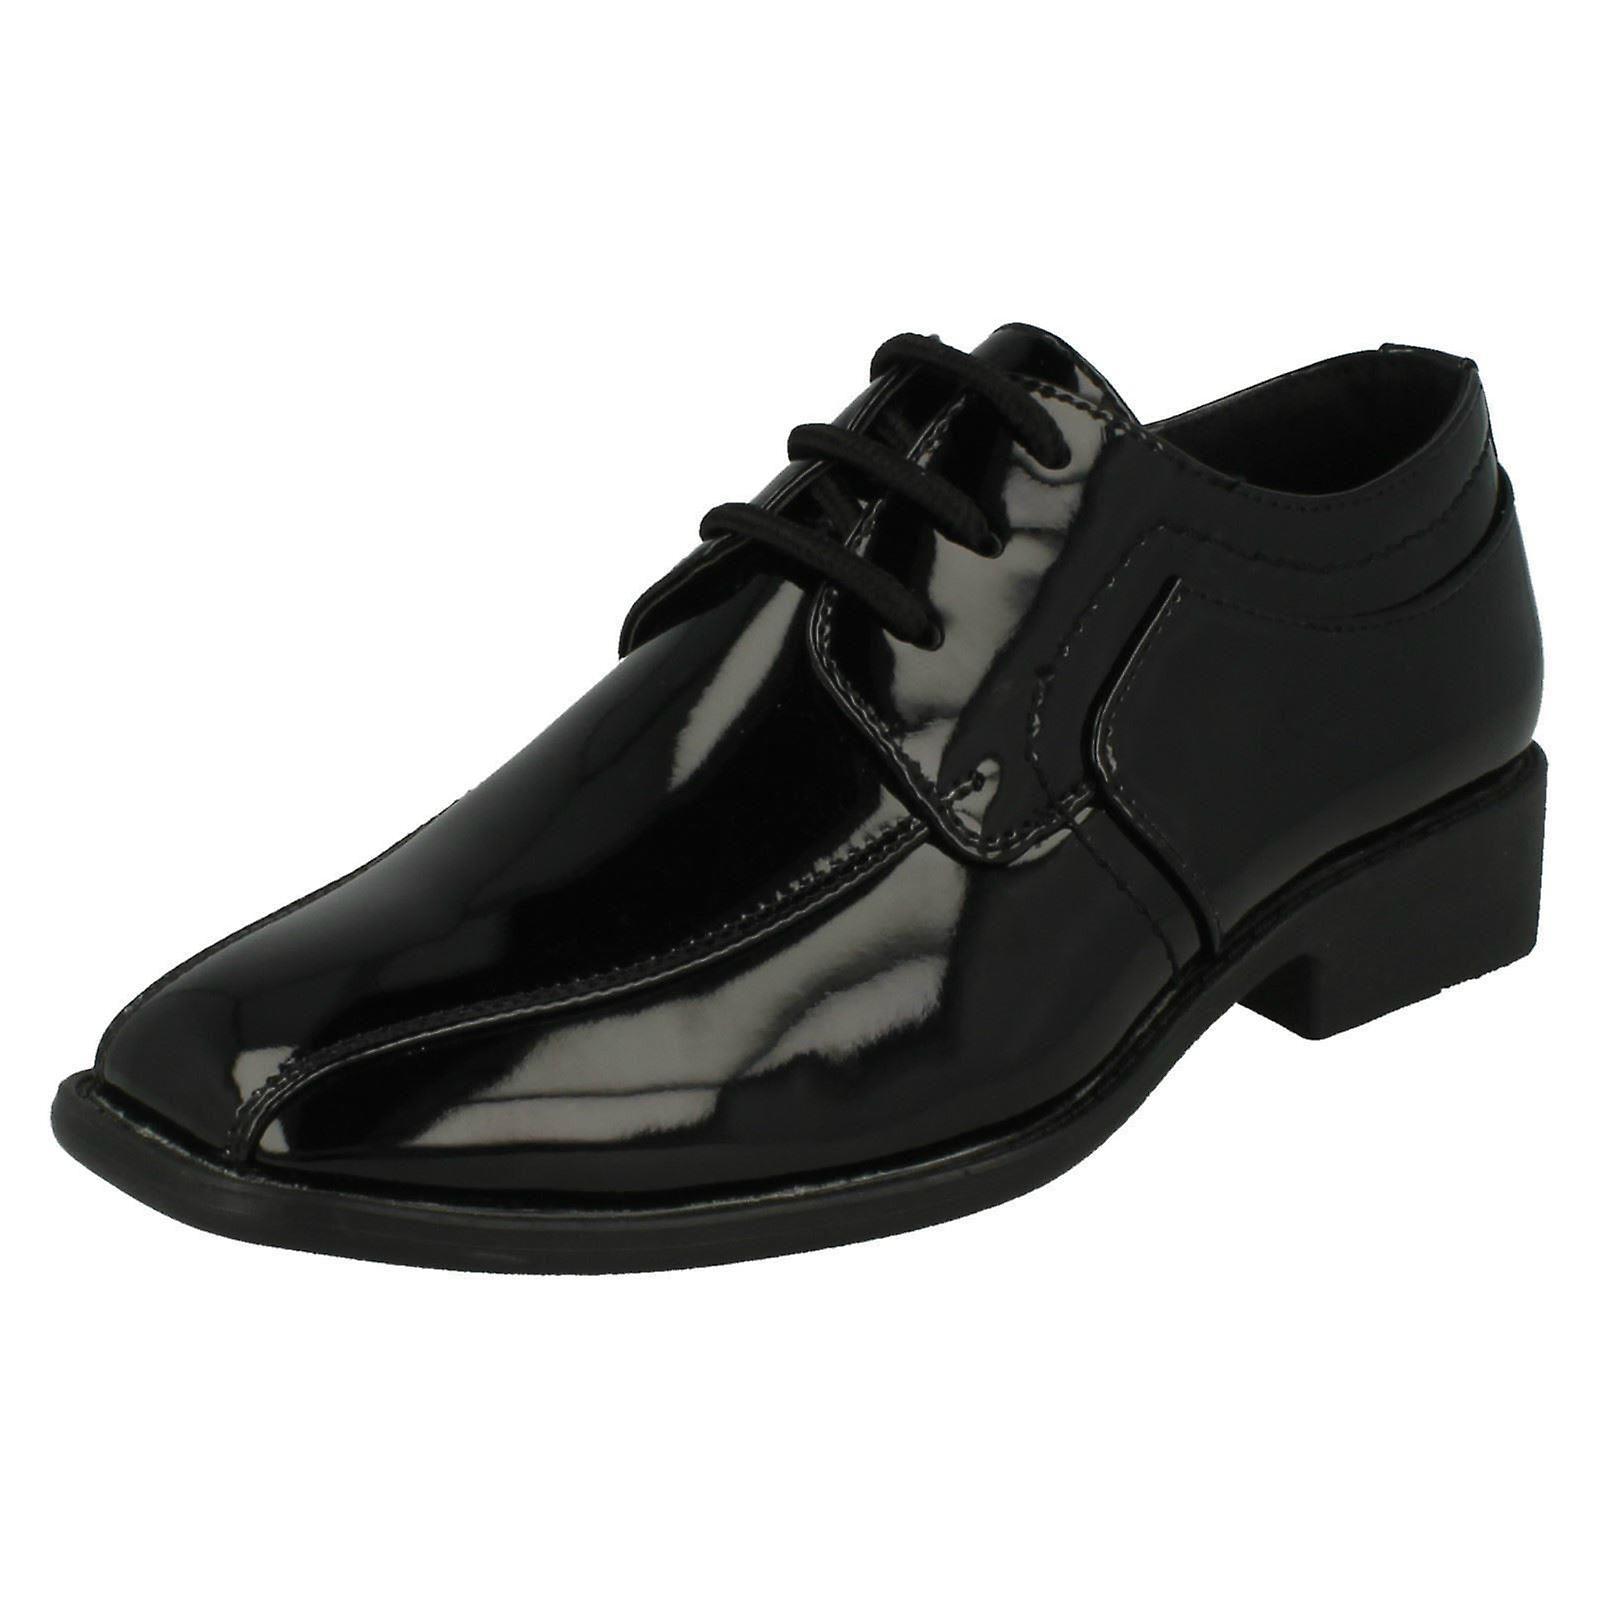 Jungen JCDees trendige Schnürung formale Schuhe N1109